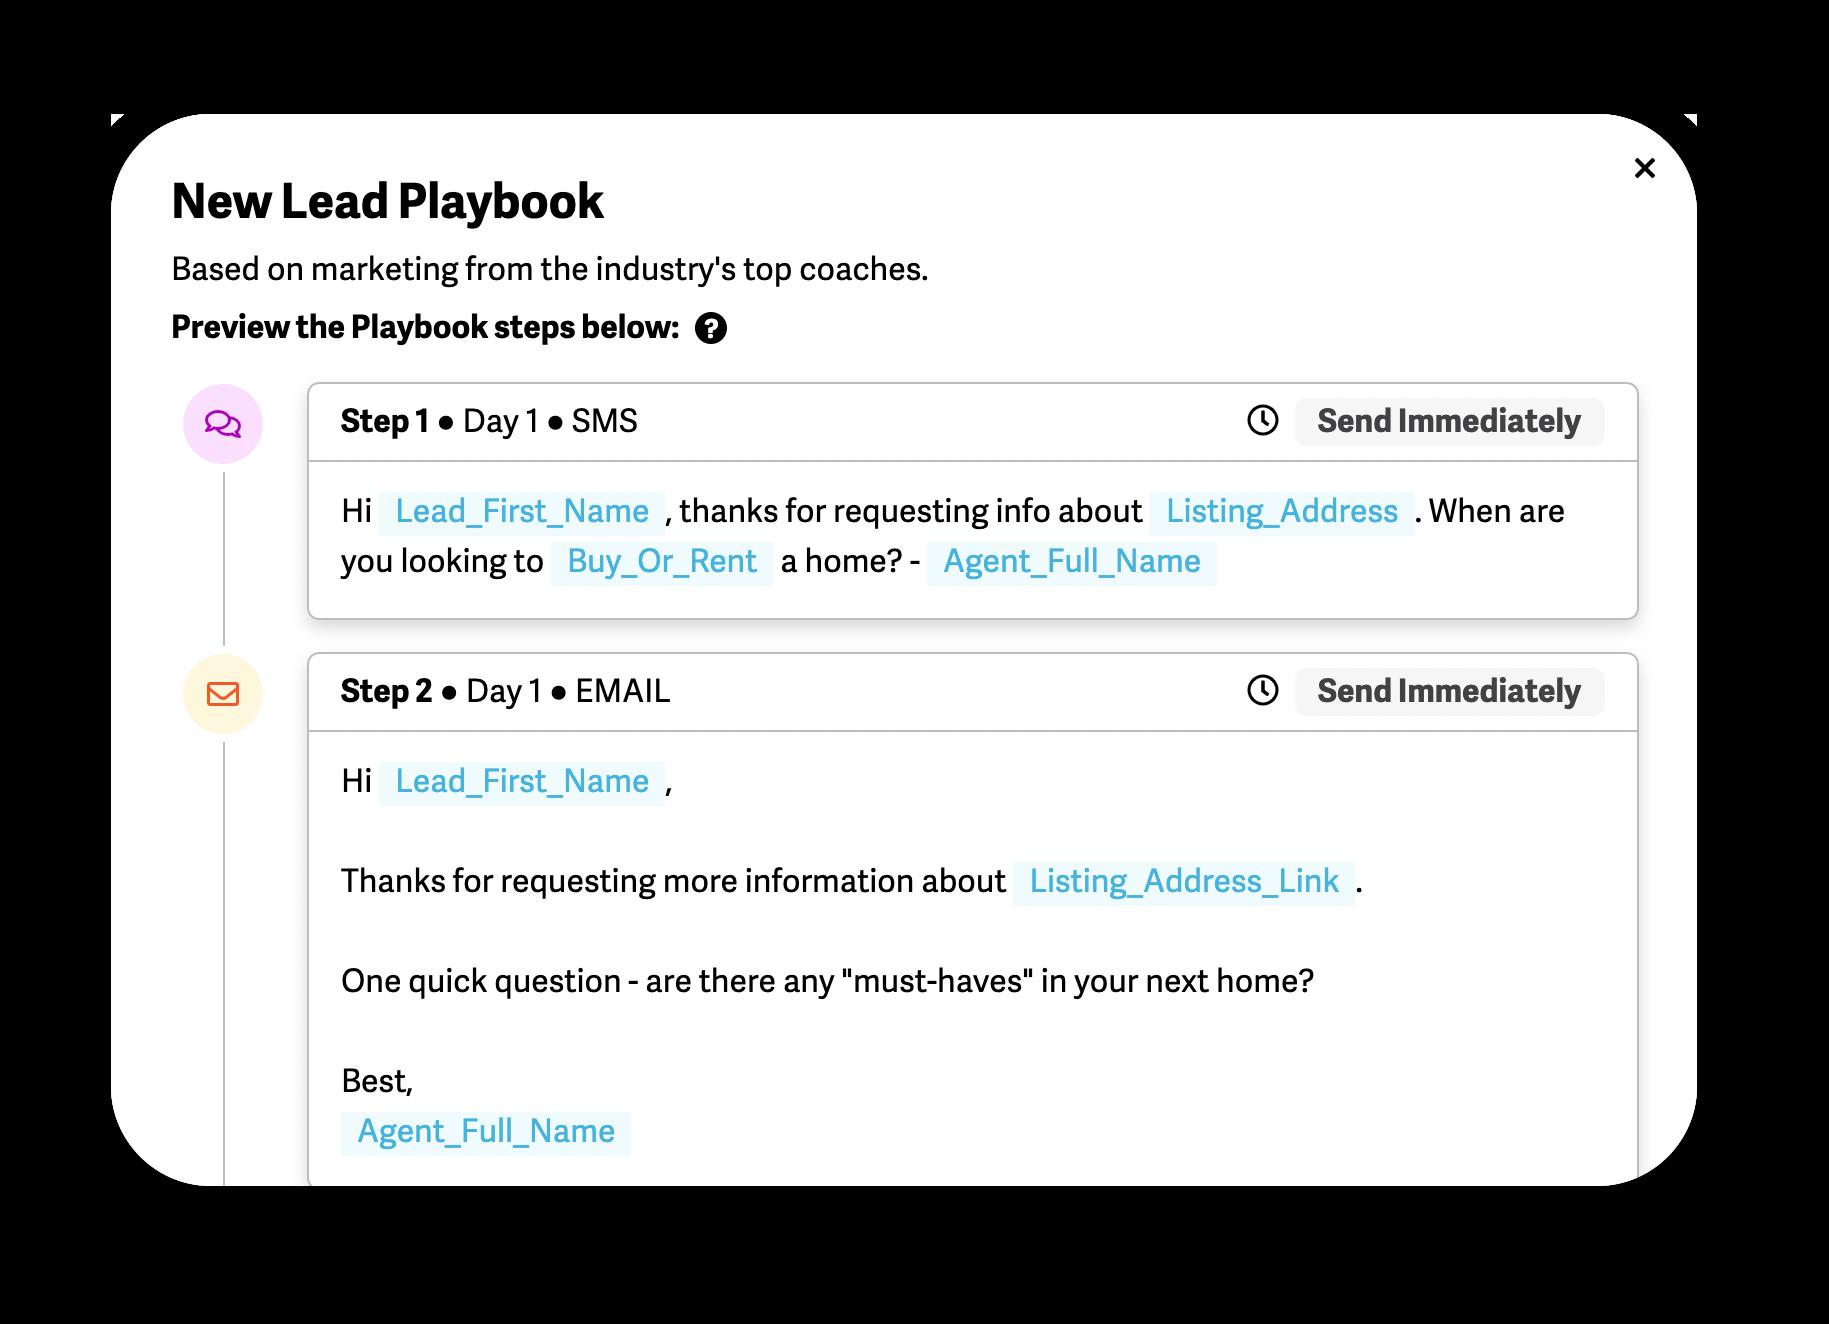 PropertySimple's new lead playbook